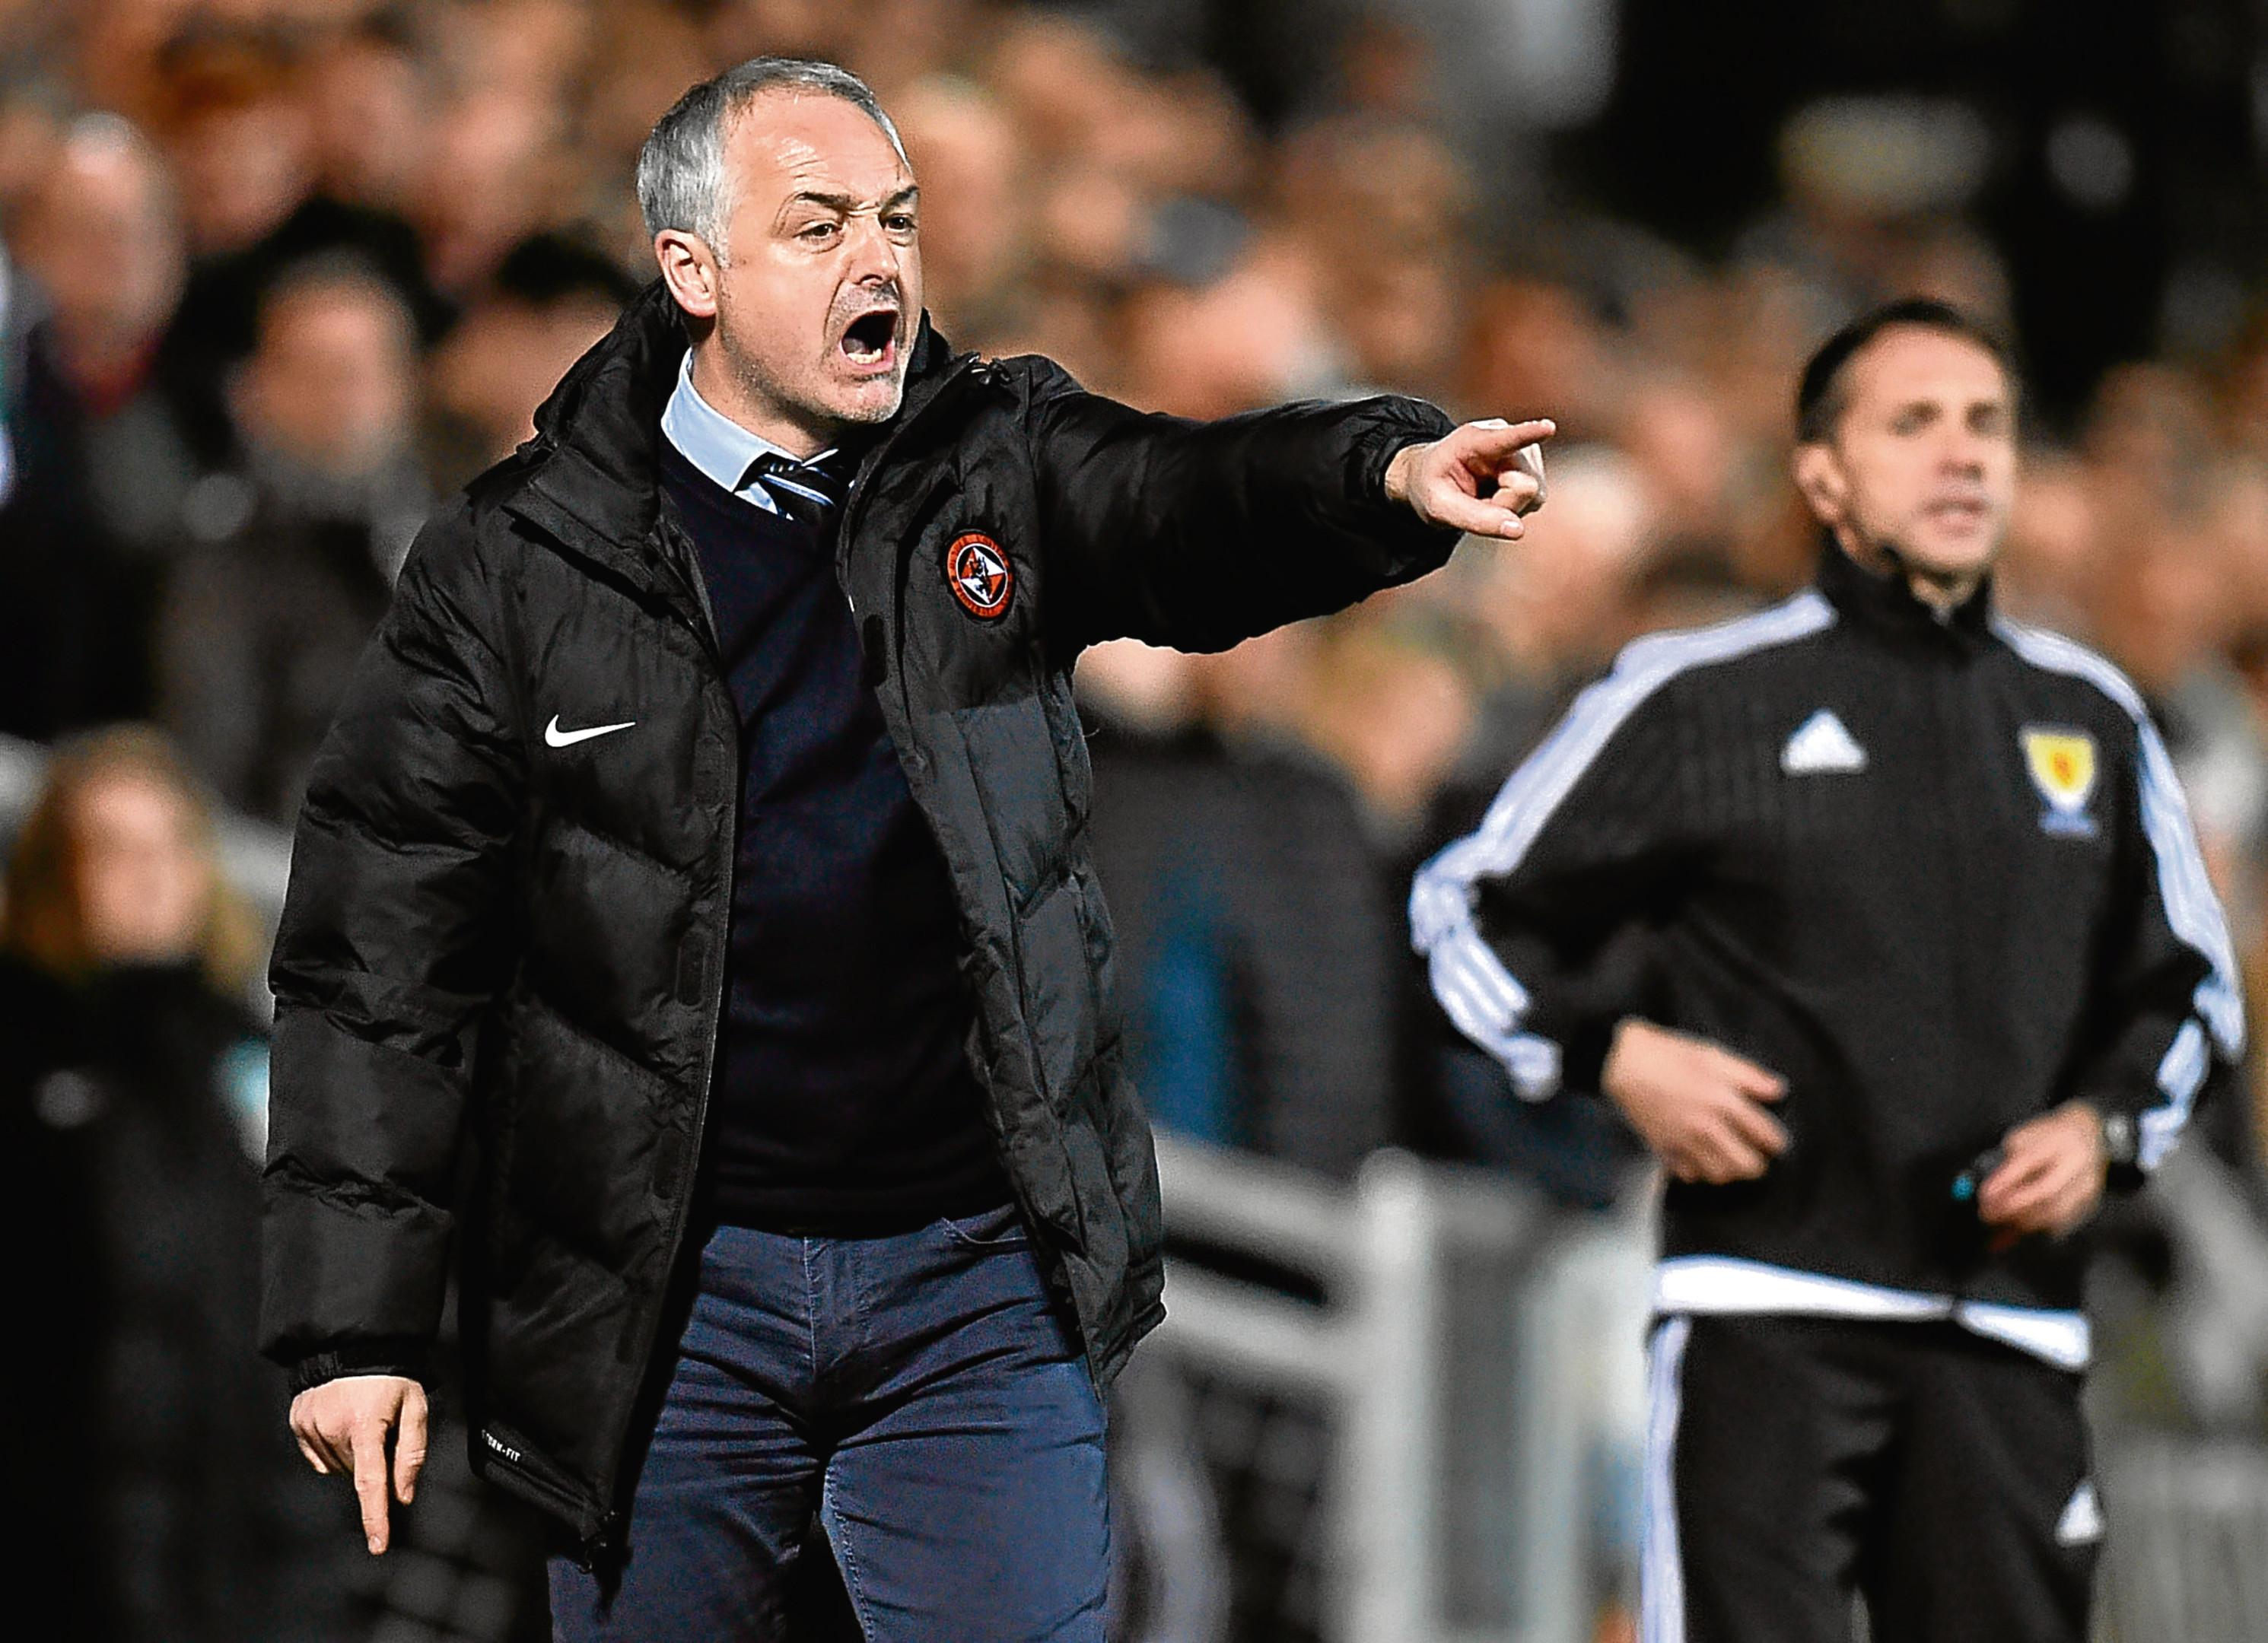 10/03/17 LADBROKES CHAMPIONSHIP   DUNDEE UNITED v HIBERNIAN (0-1)  TANNADICE PARK - DUNDEE   Dundee United manager Ray McKinnon